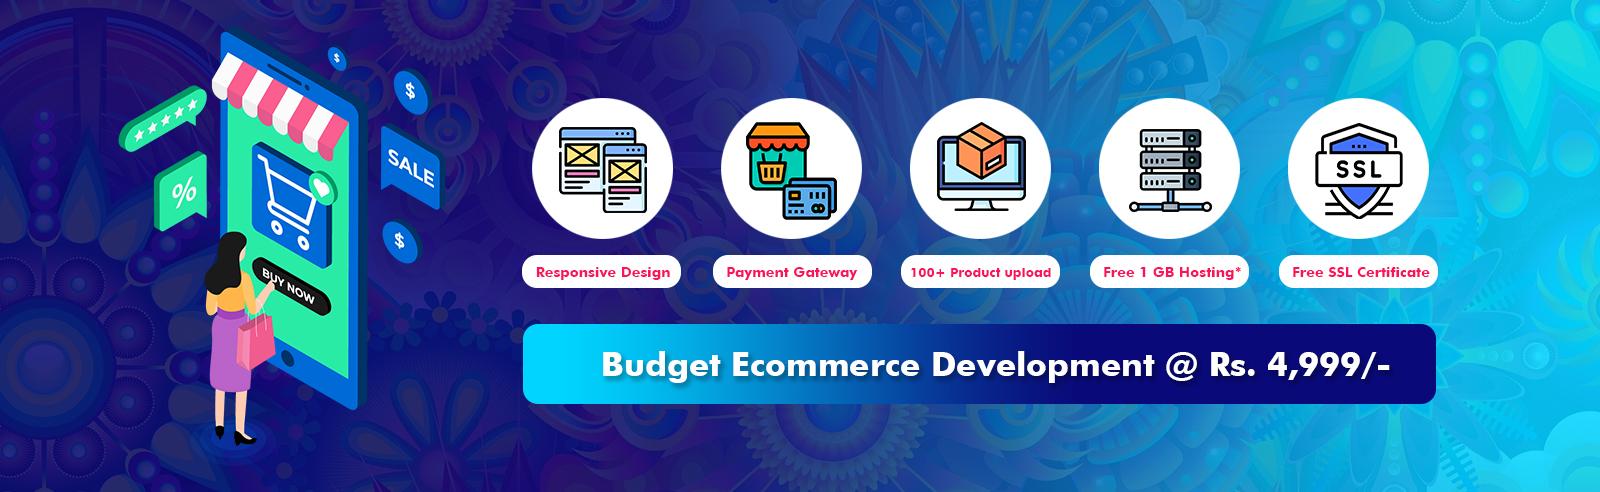 Affordable E-Commerce Web Design Company